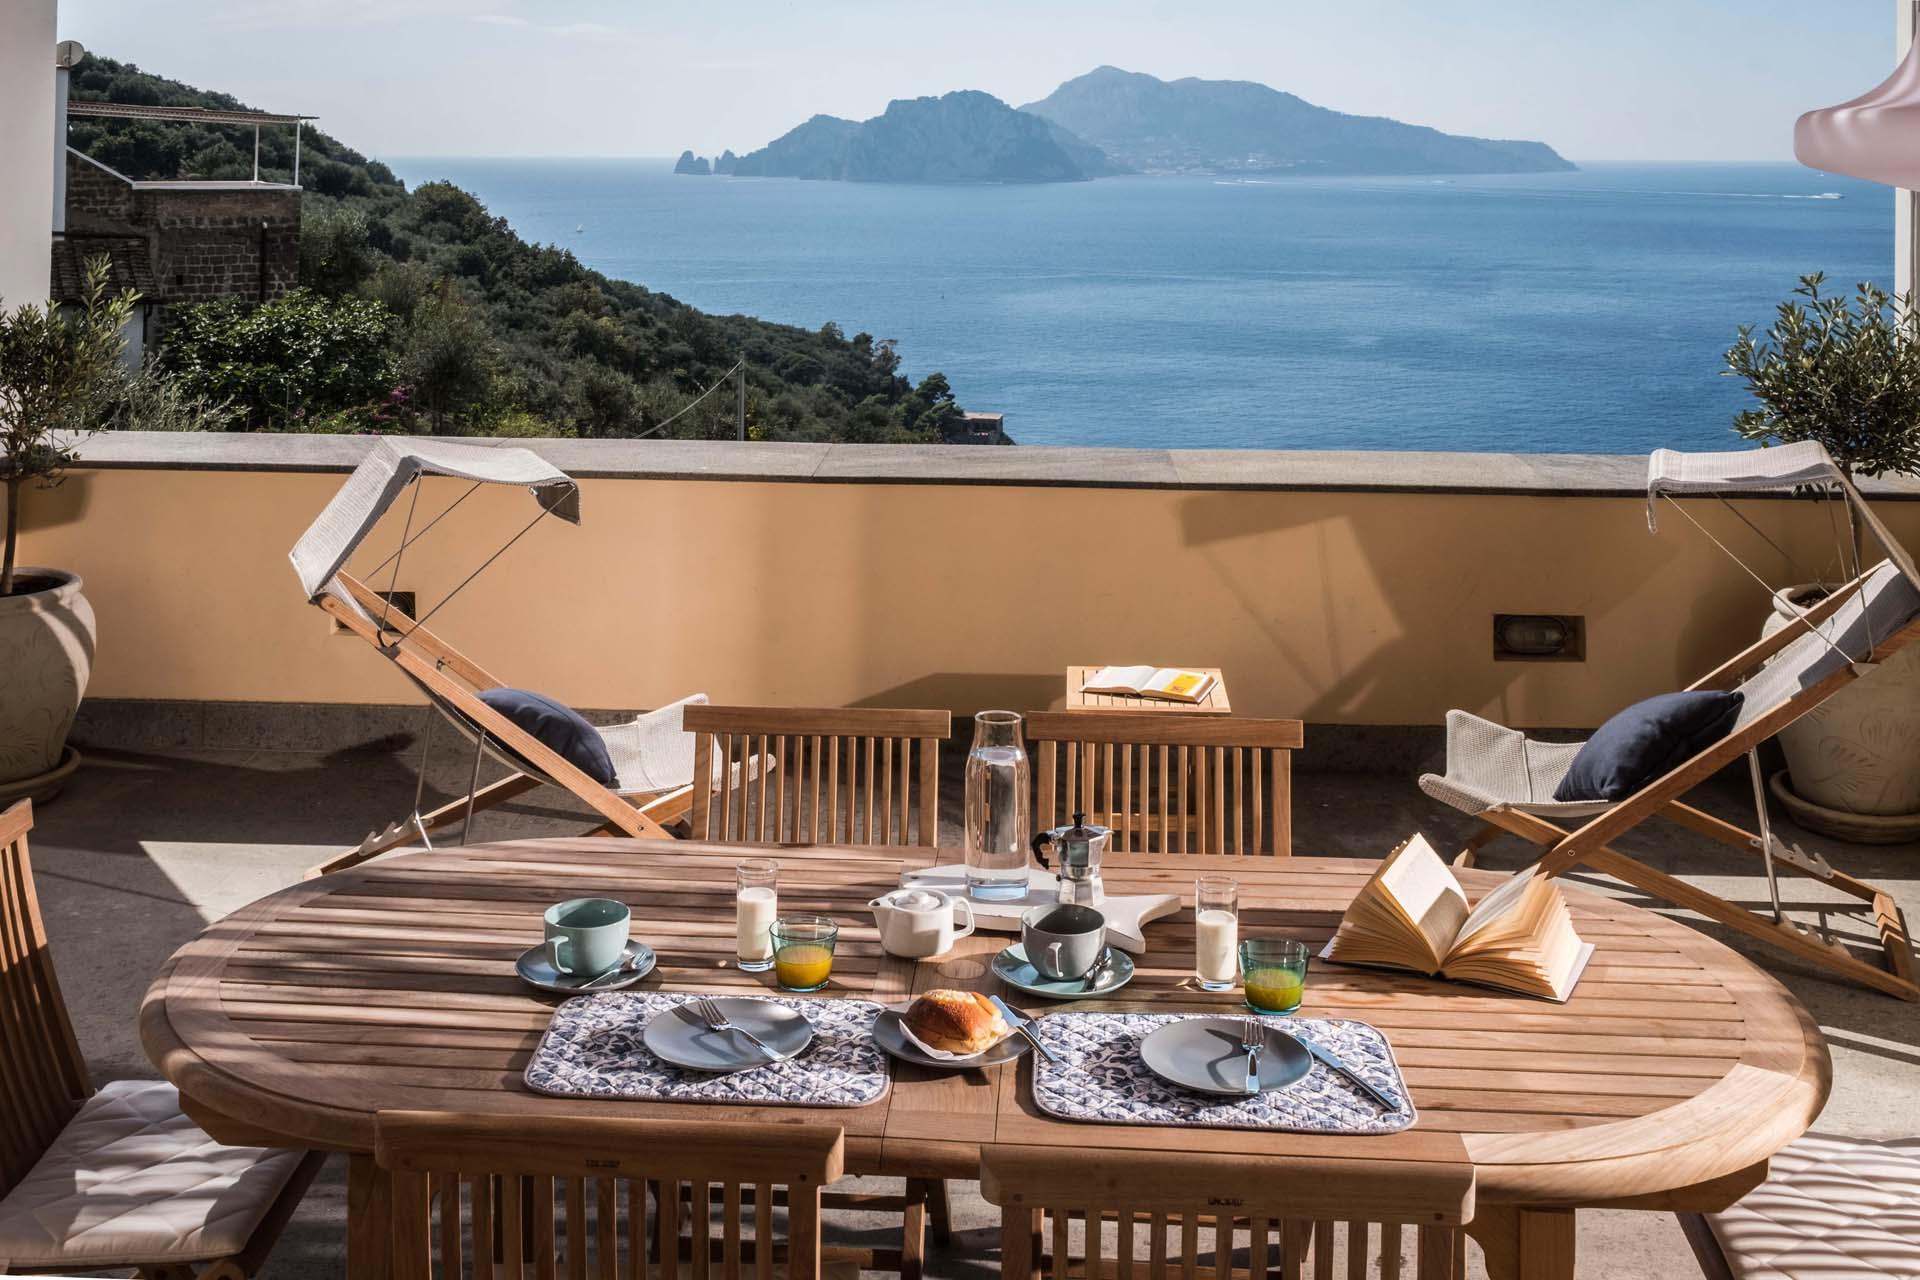 Villa Capri View on Sorrento Coast